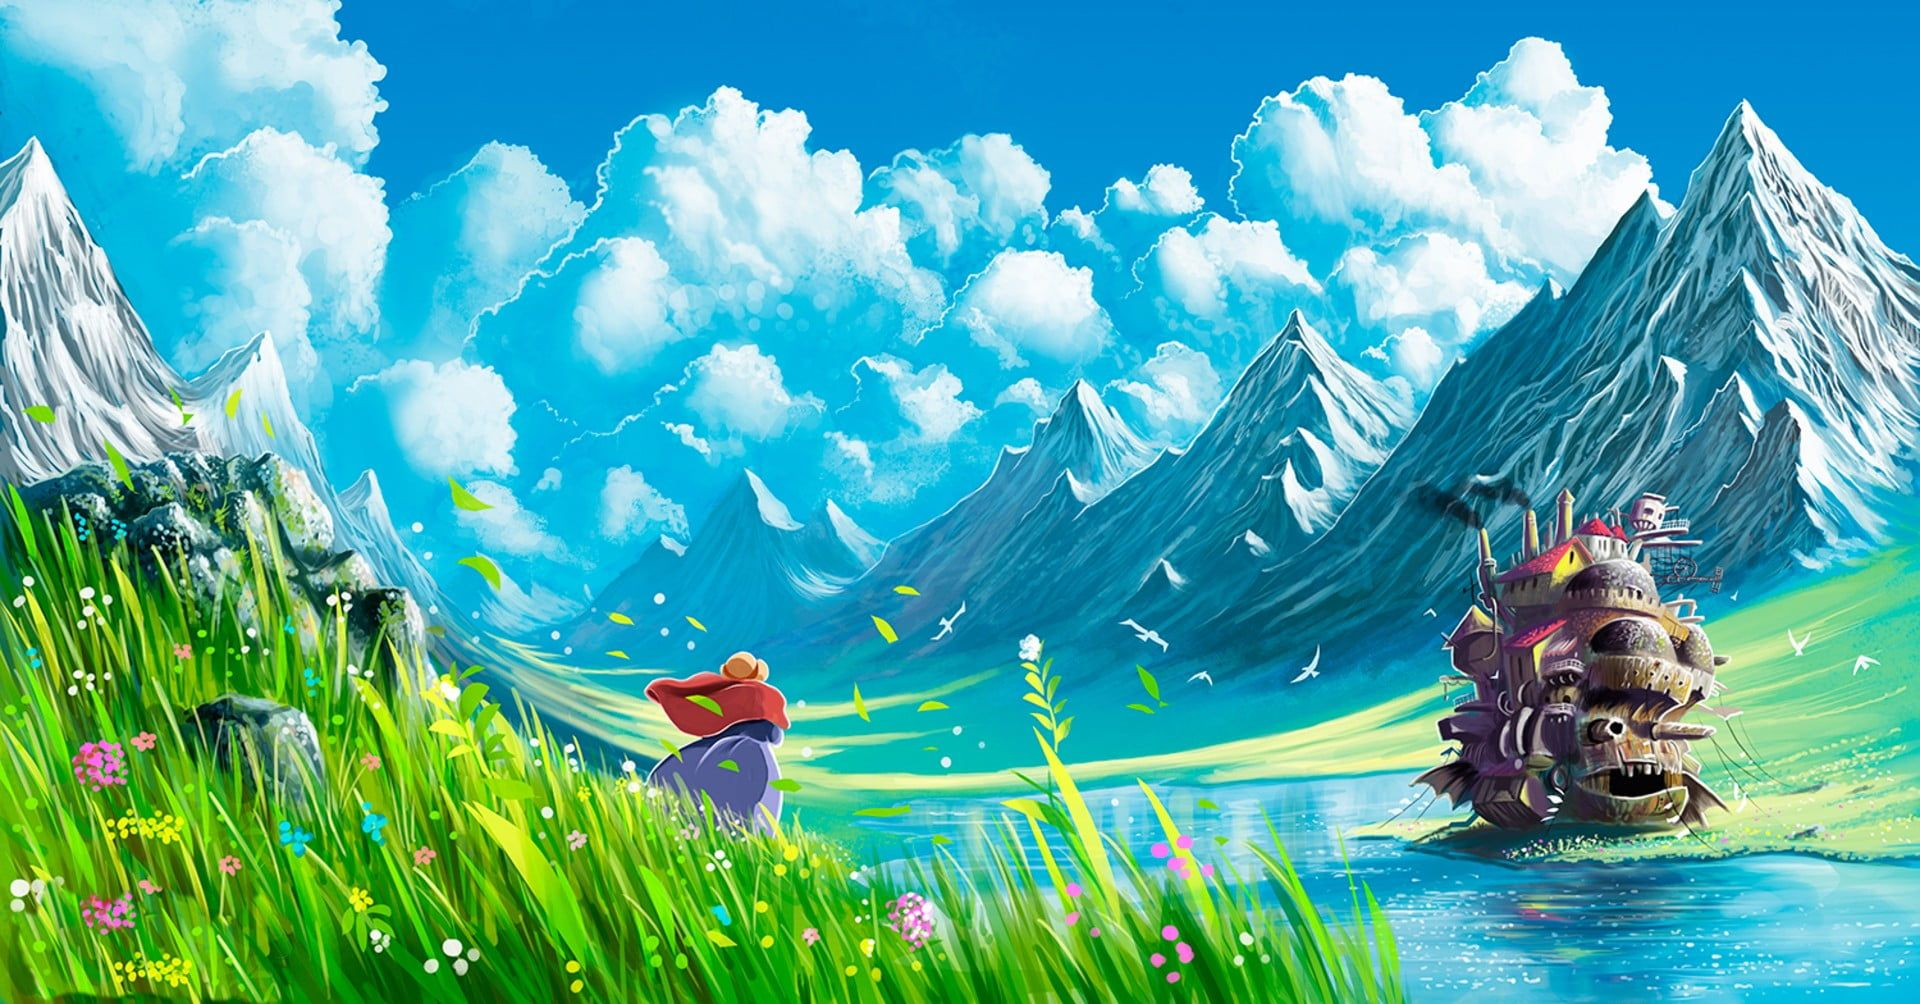 Game Digital Wallpaper Studio Ghibli Howl S Moving Castle Mountains Anime Landscape 1080p Wa Digital Wallpaper Howls Moving Castle Wallpaper Studio Ghibli